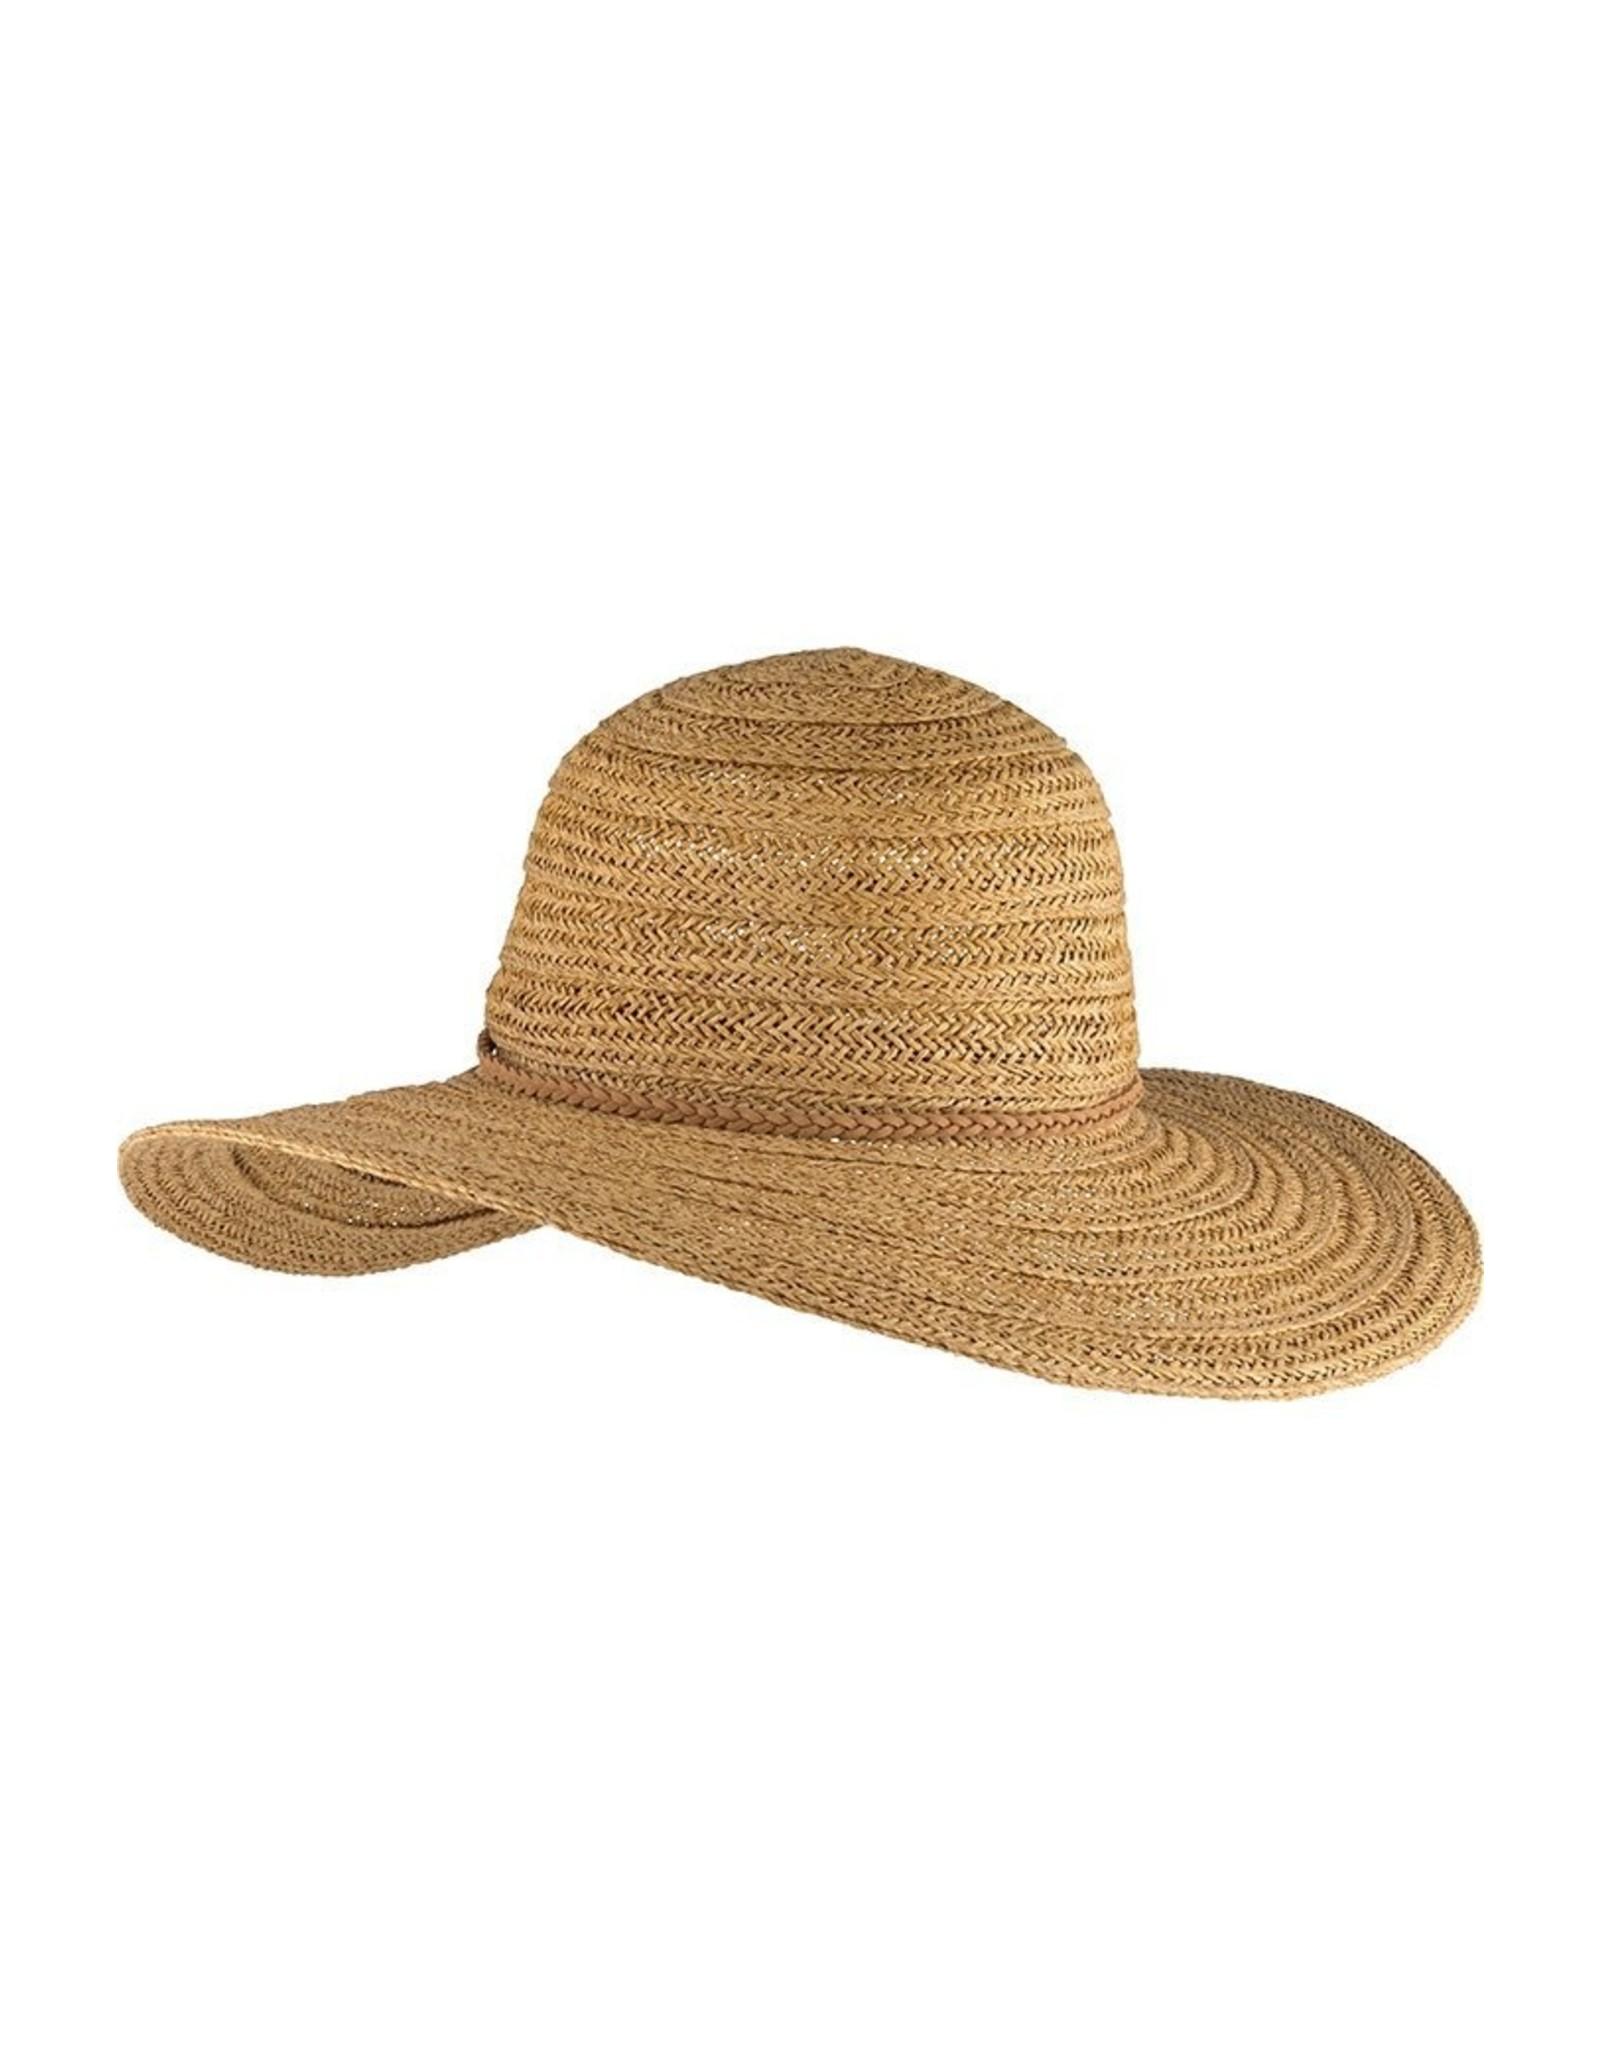 KOORINGAL LADIES' WIDE-BRIM HAT - TESS